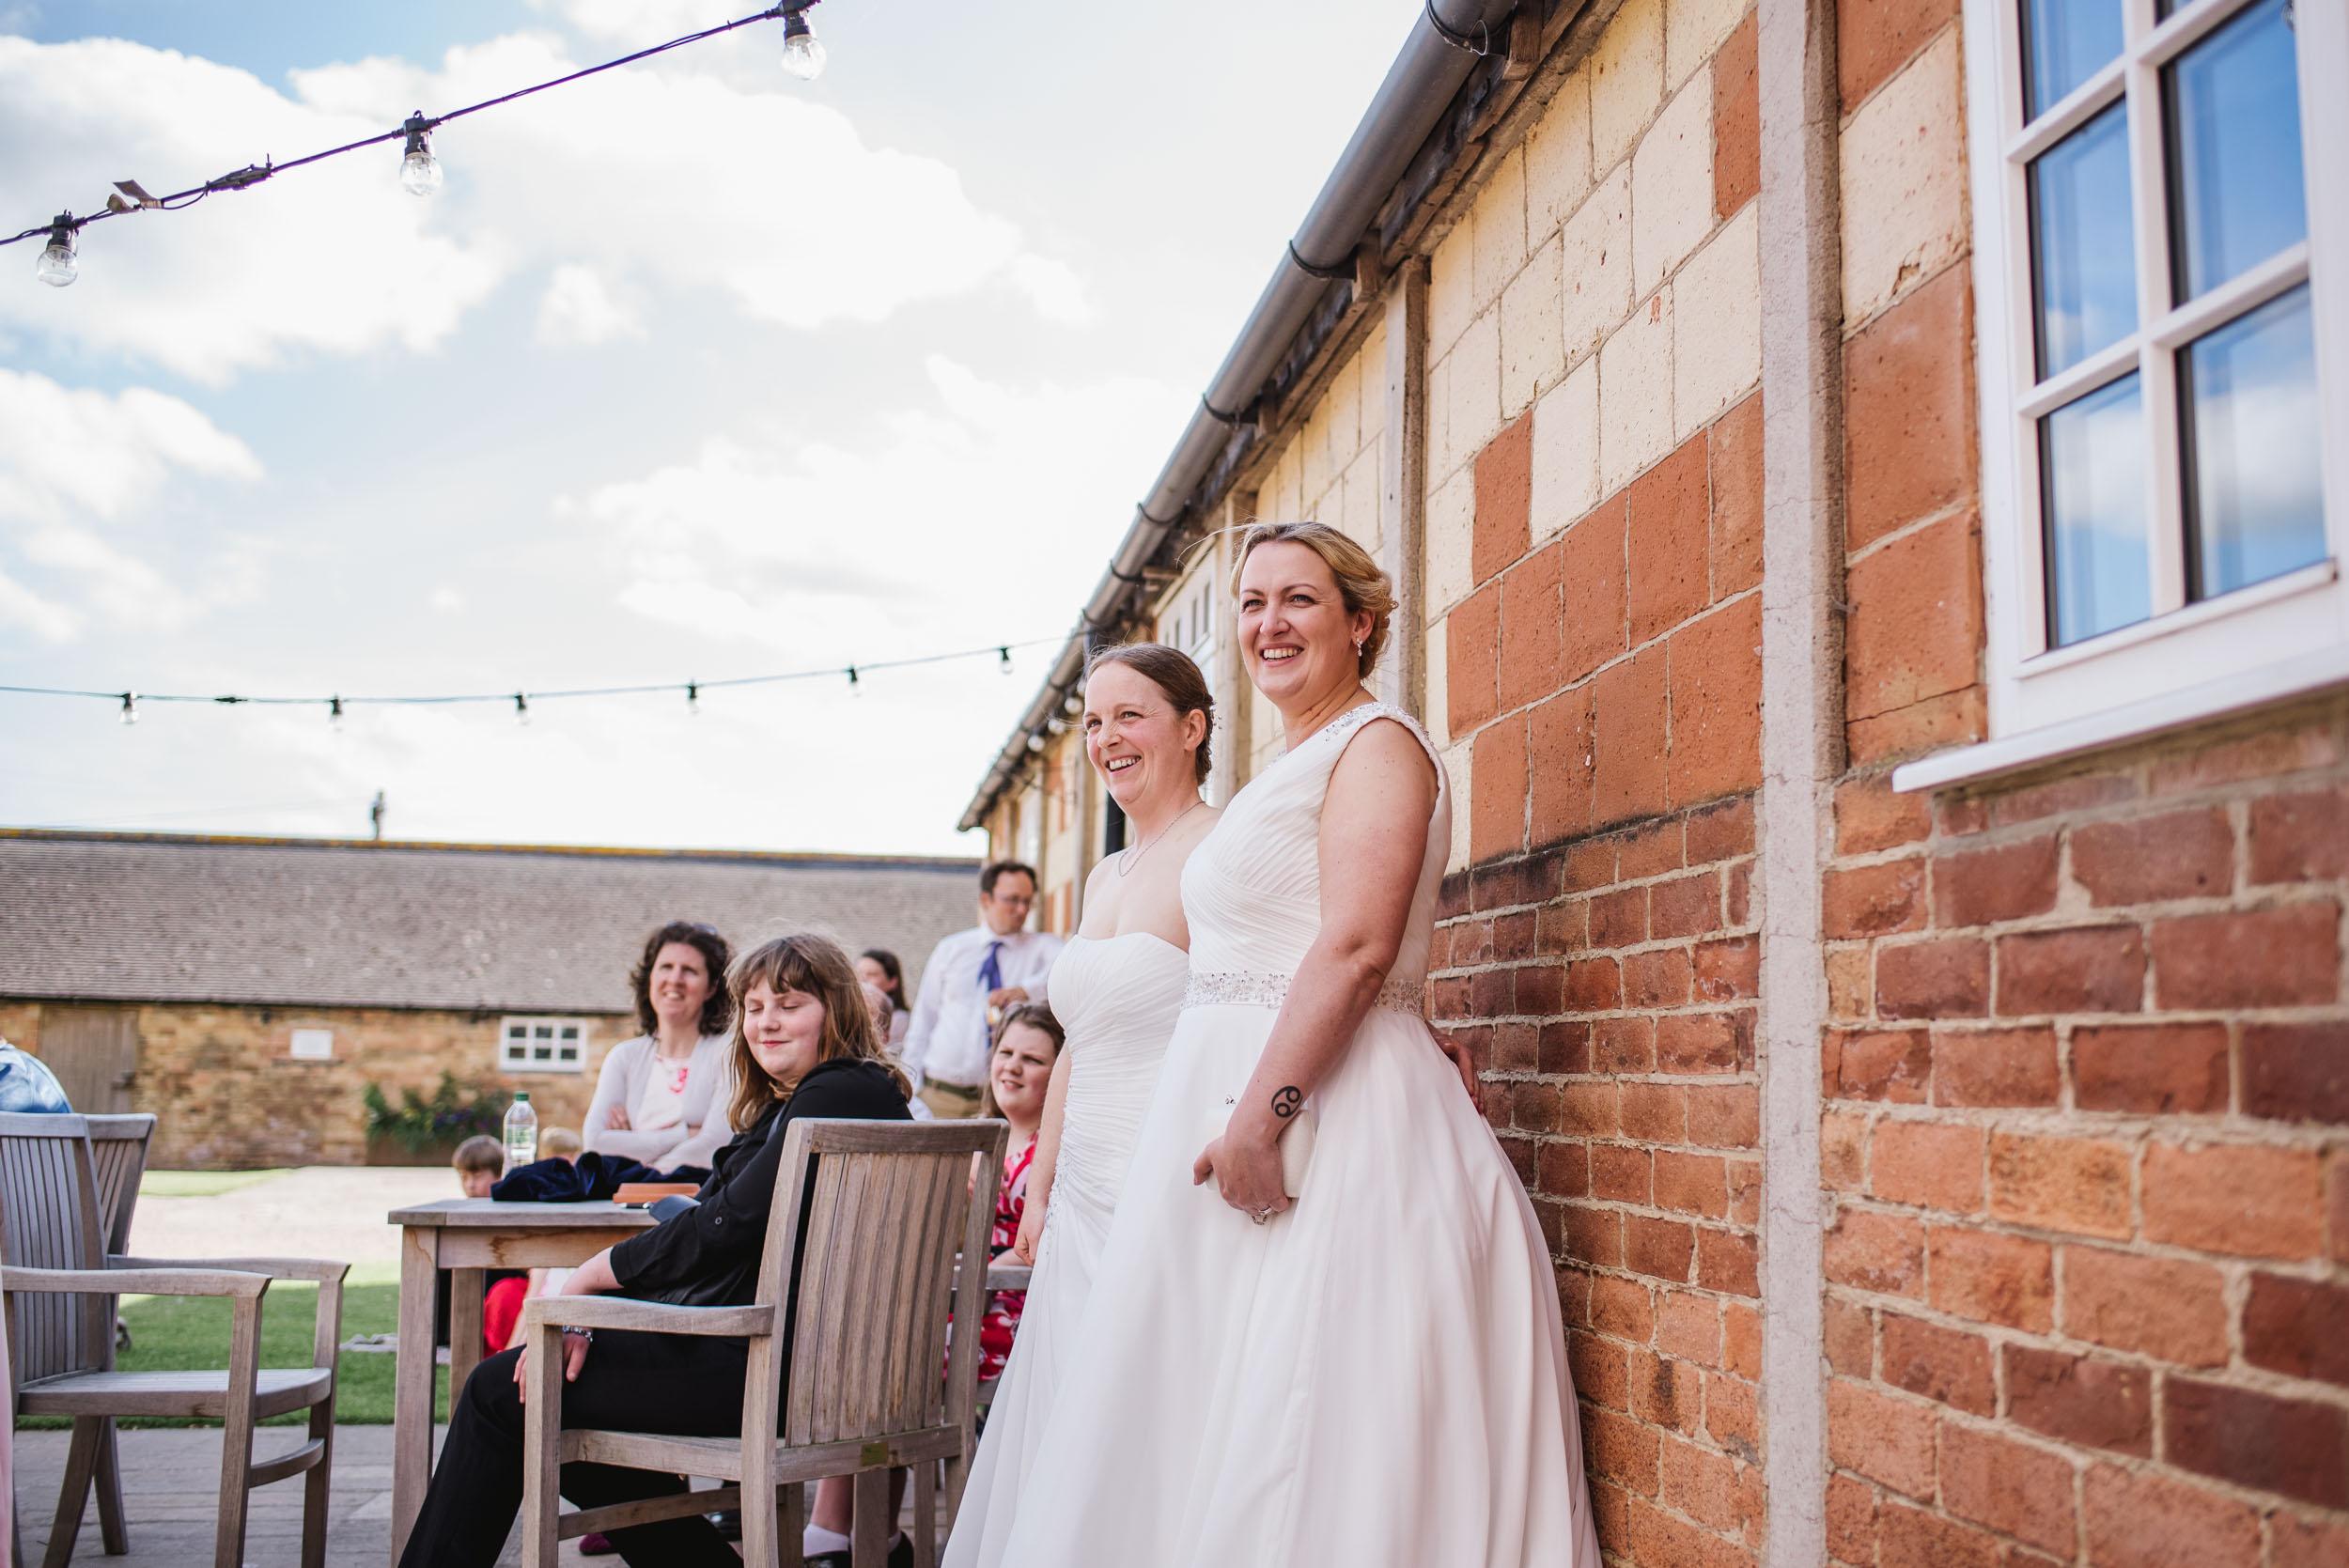 Donington-park-farm-wedding-photography-468.jpg